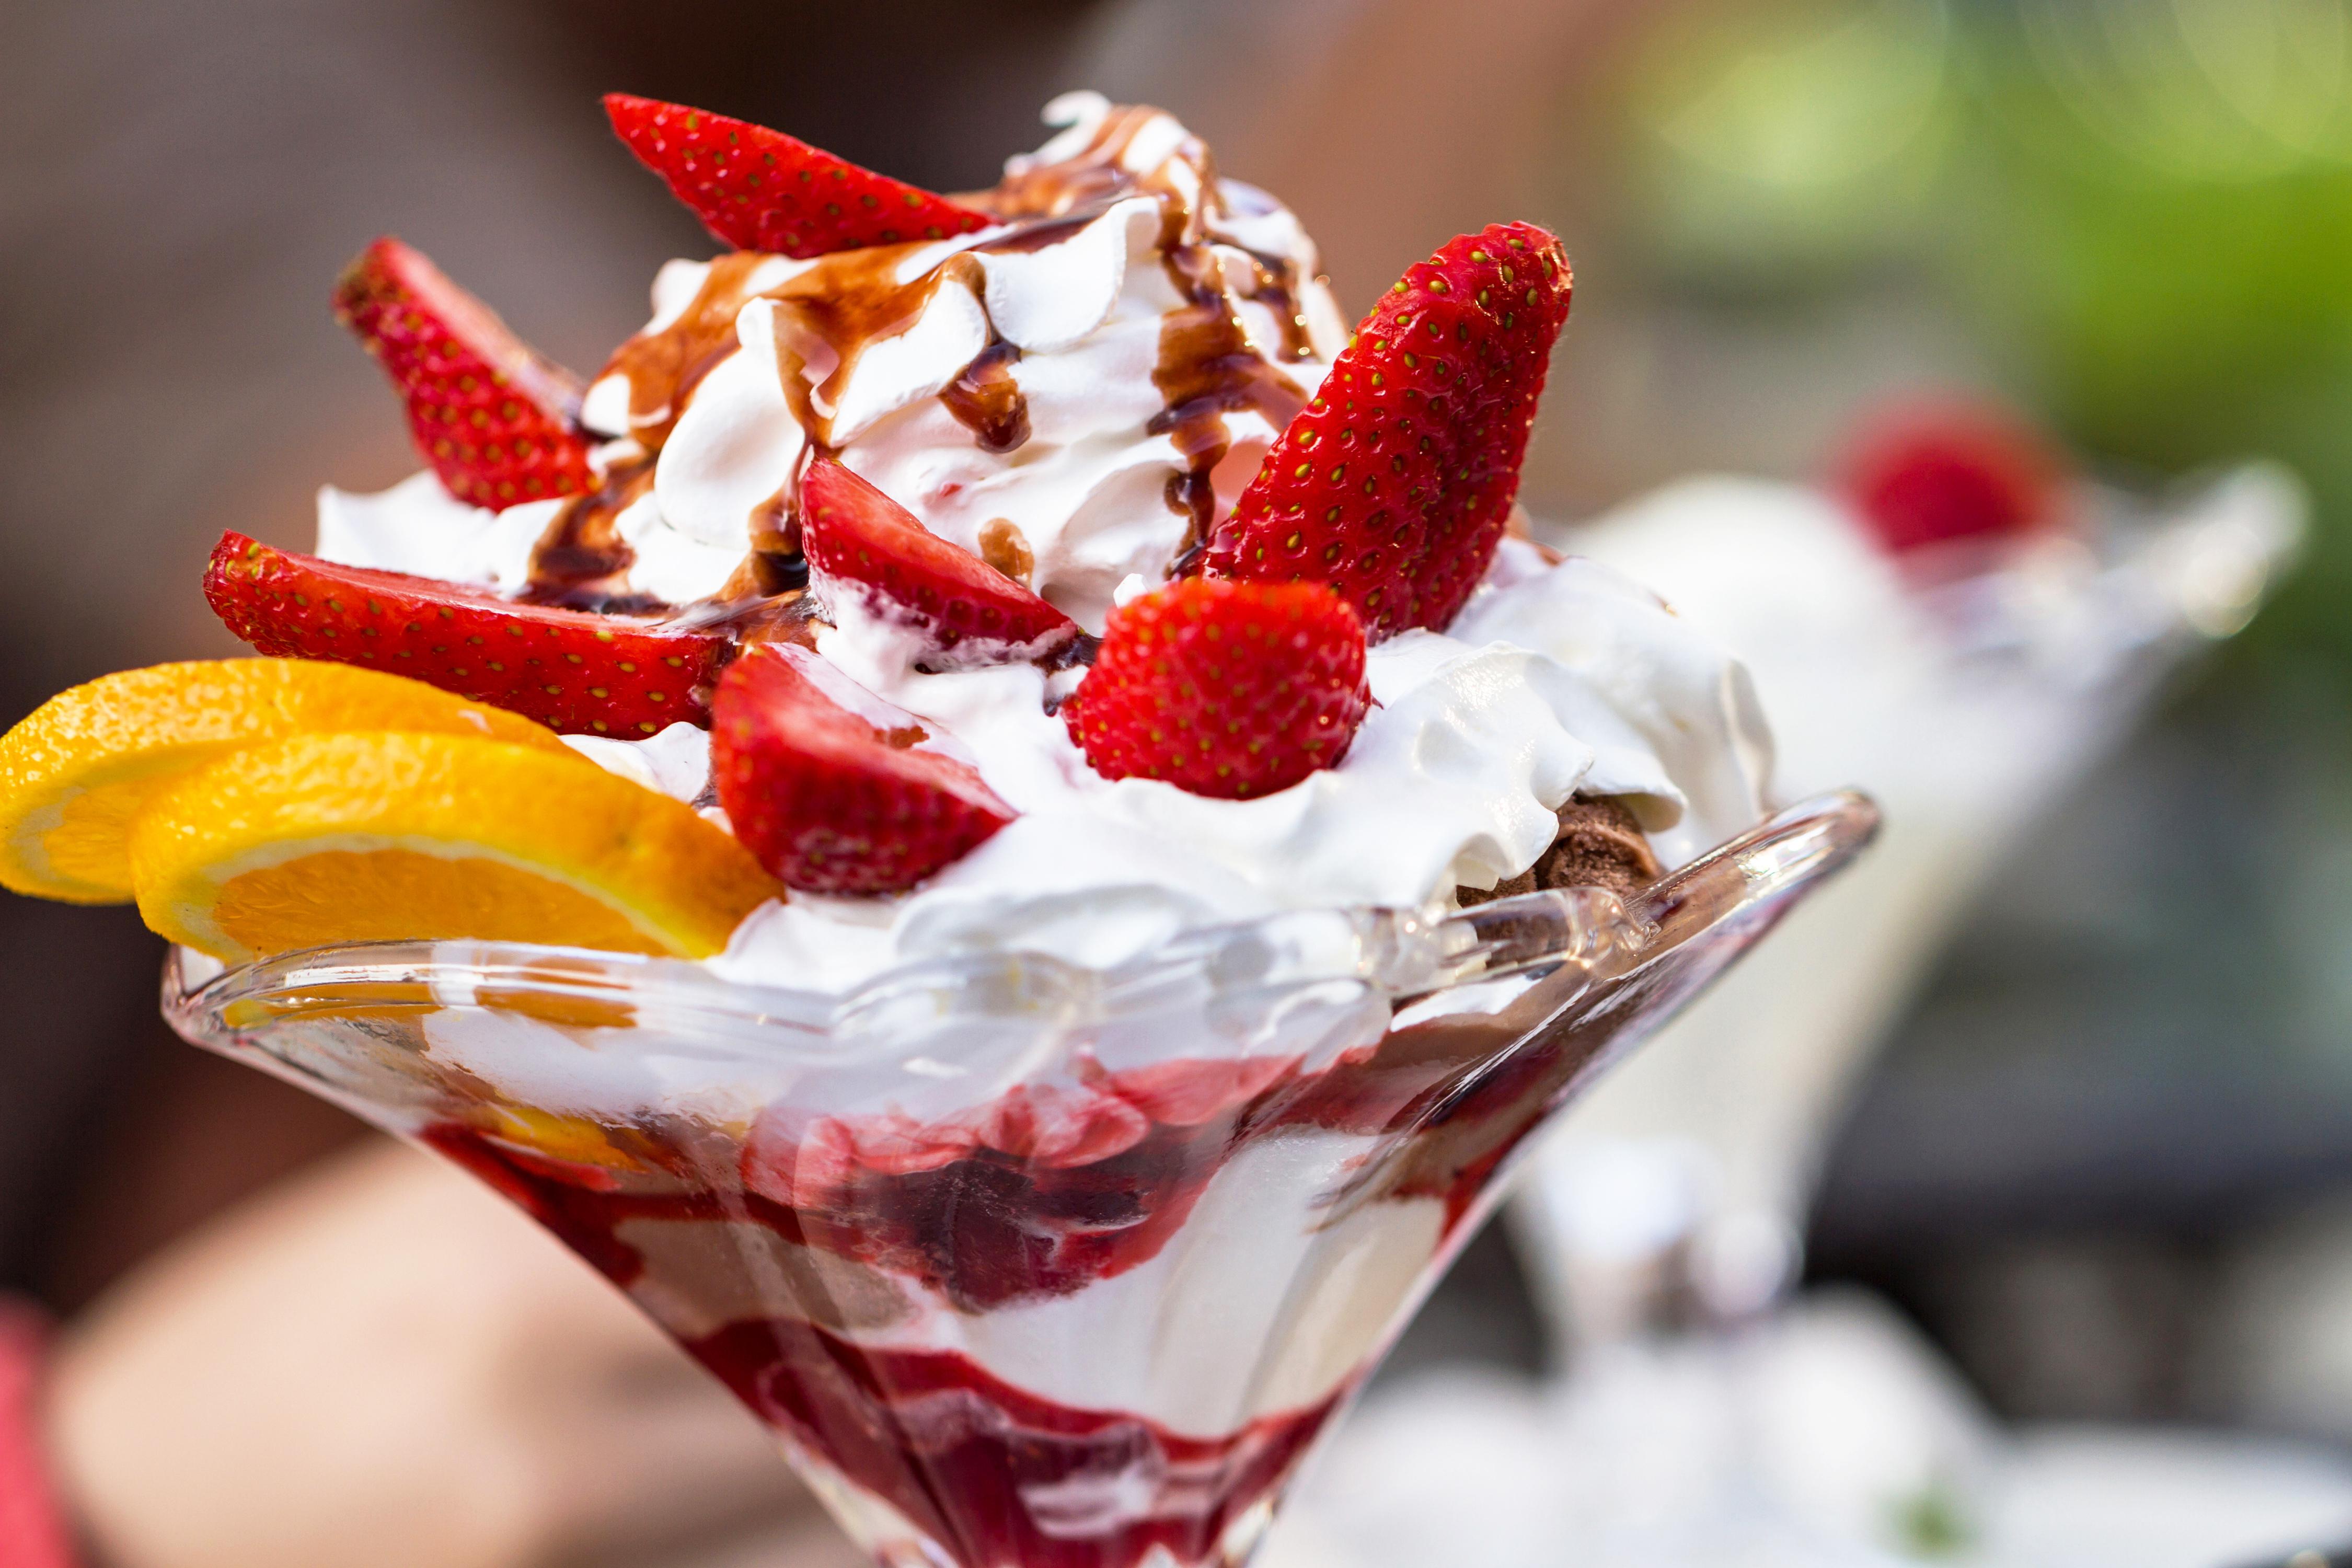 Открытка красивое мороженое, панорамные картинки